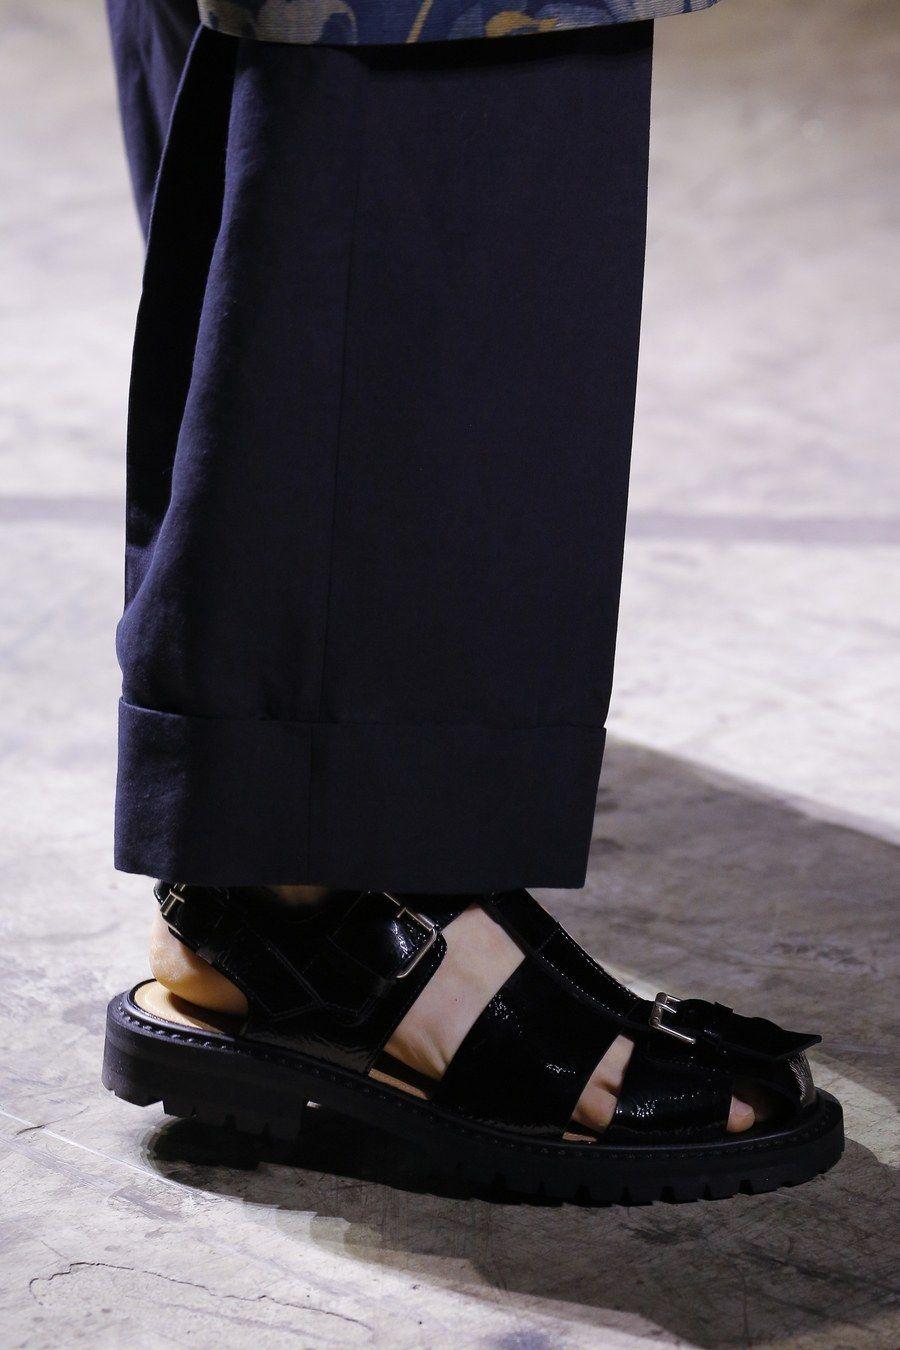 Dries Spring 2017 Noten Van Show Fashion Menswear 1l3uTFKcJ